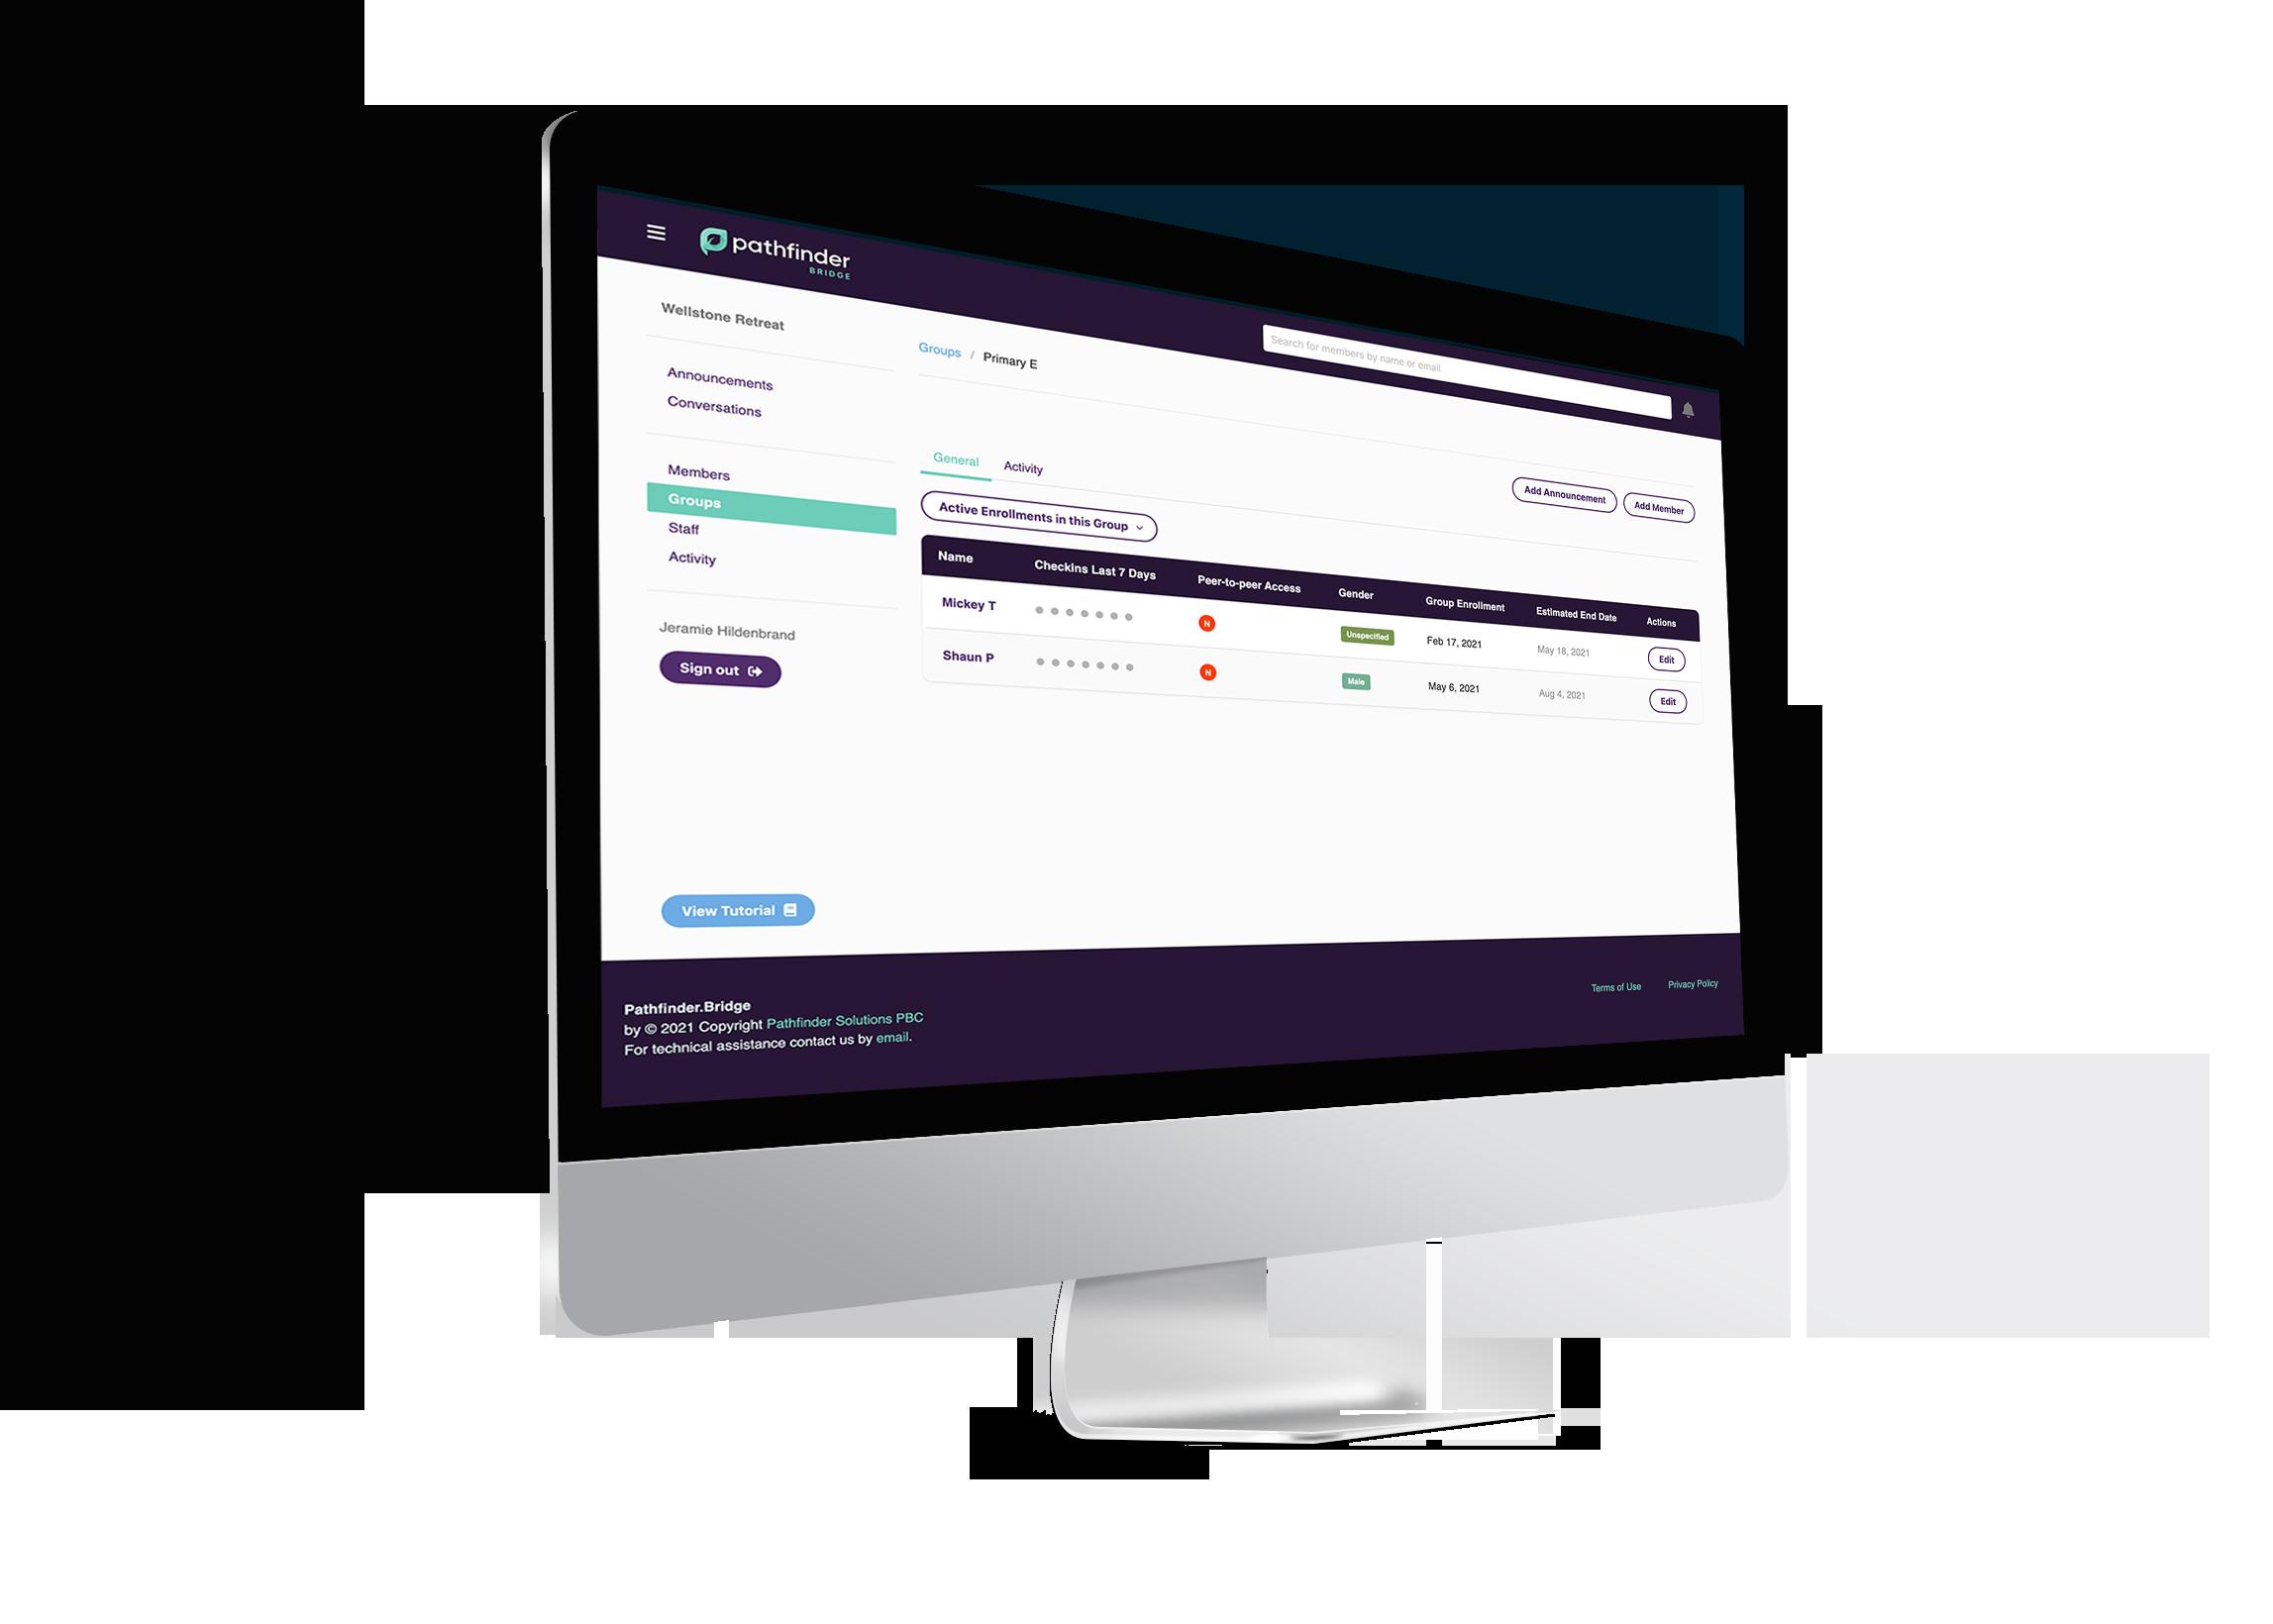 bridge user interface